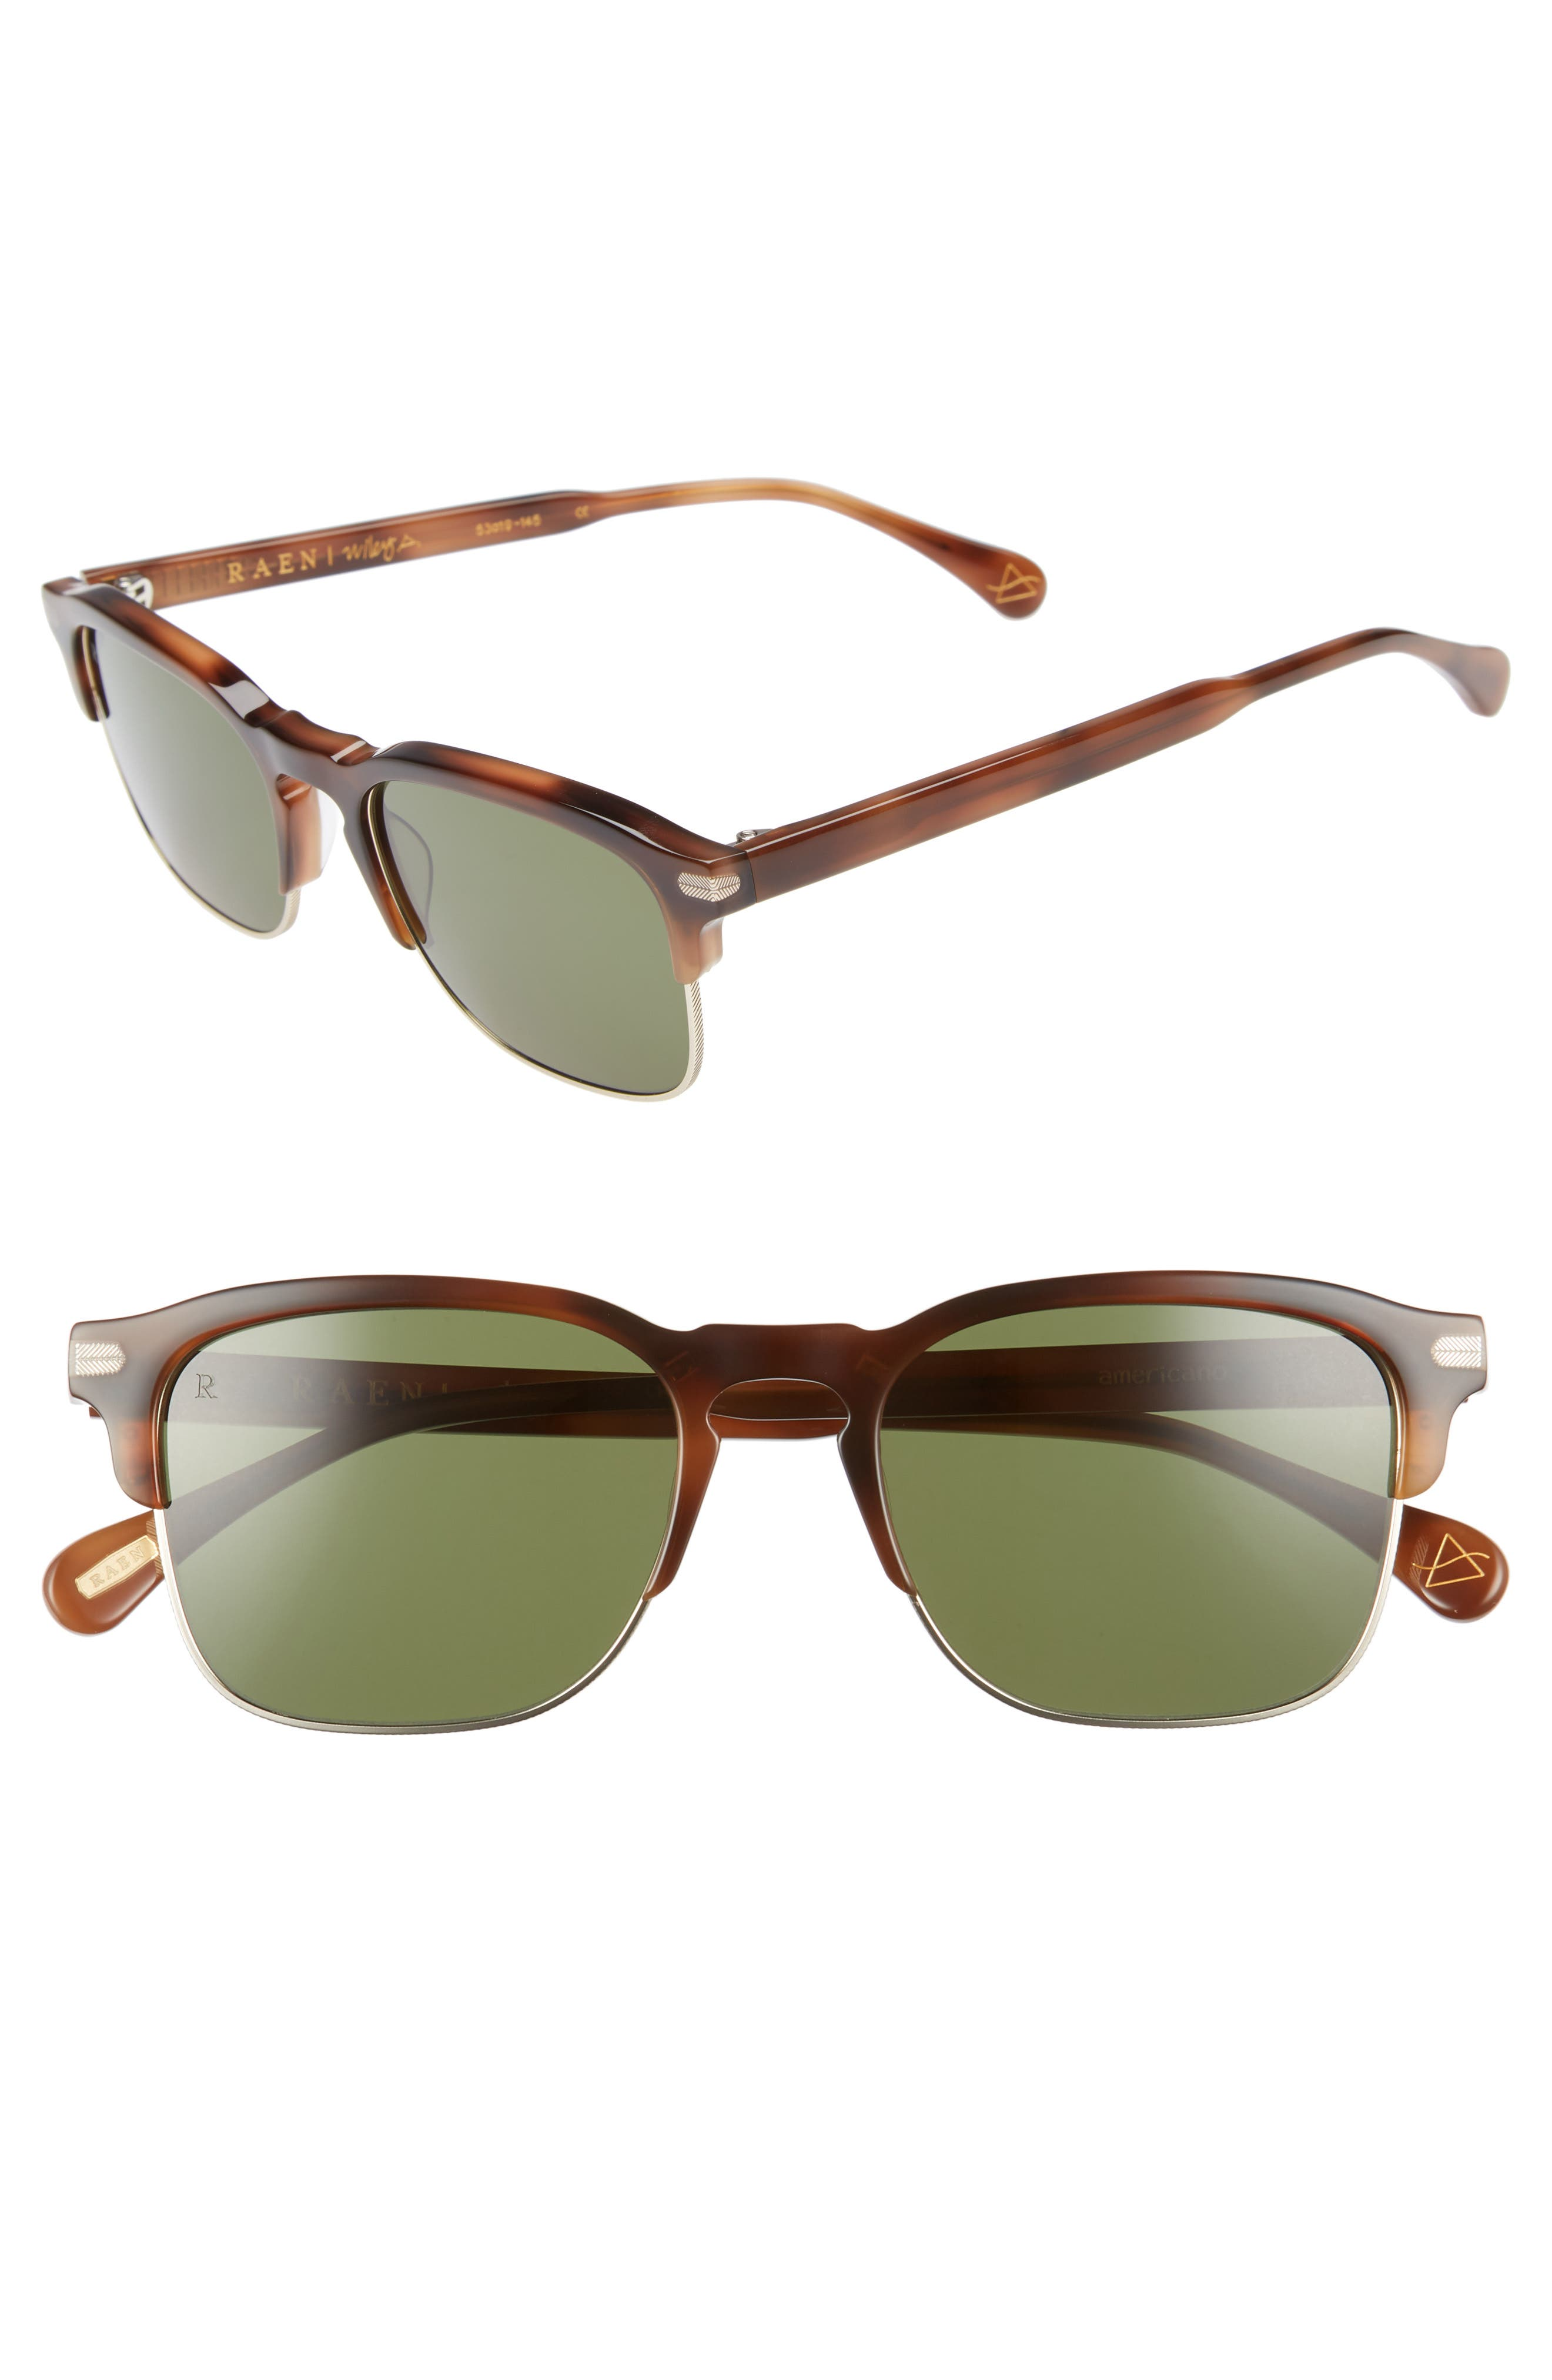 7fe1ec6273 Raen Wiley A 53Mm Polarized Sunglasses - Brindle Tortoise ...